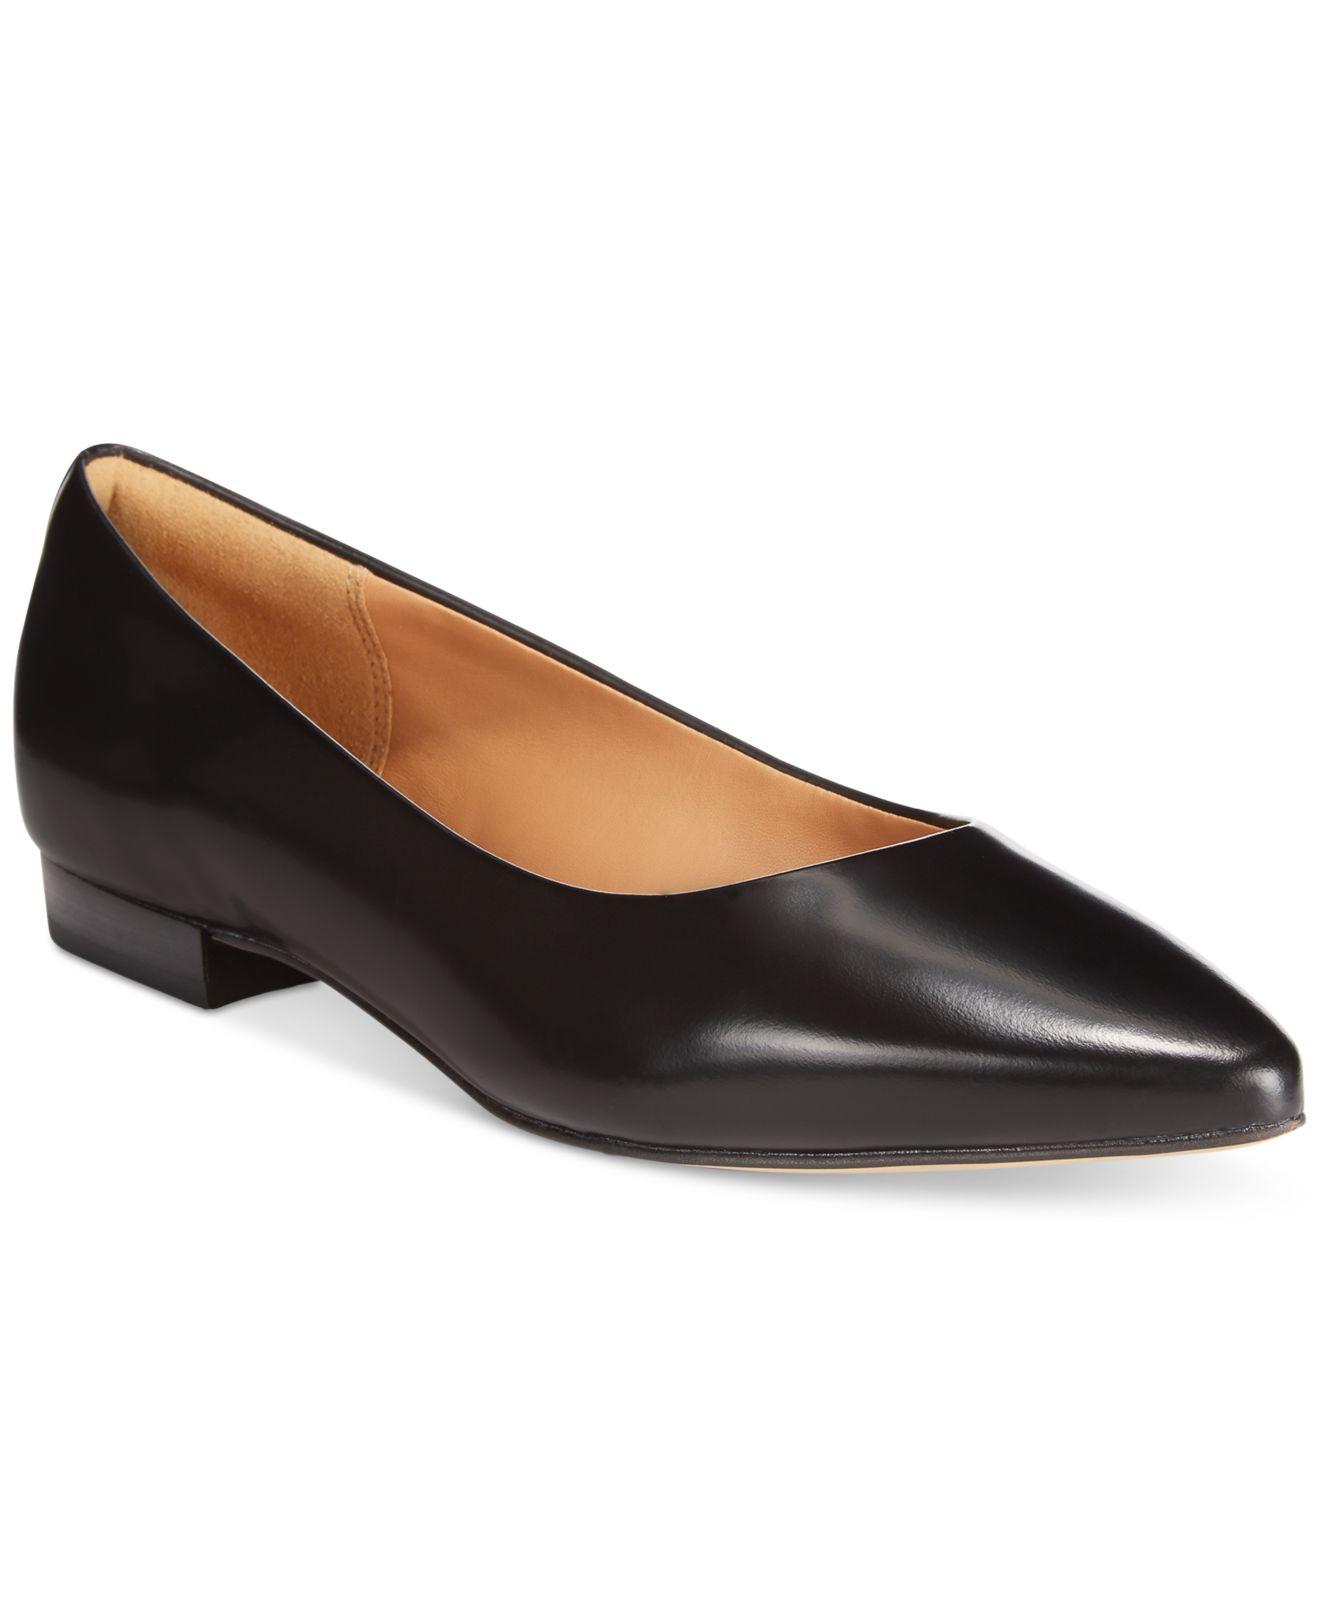 ea90f1466bd Lyst - Clarks Artisan Women s Corabeth Abby Pointed Toe Flats in Black